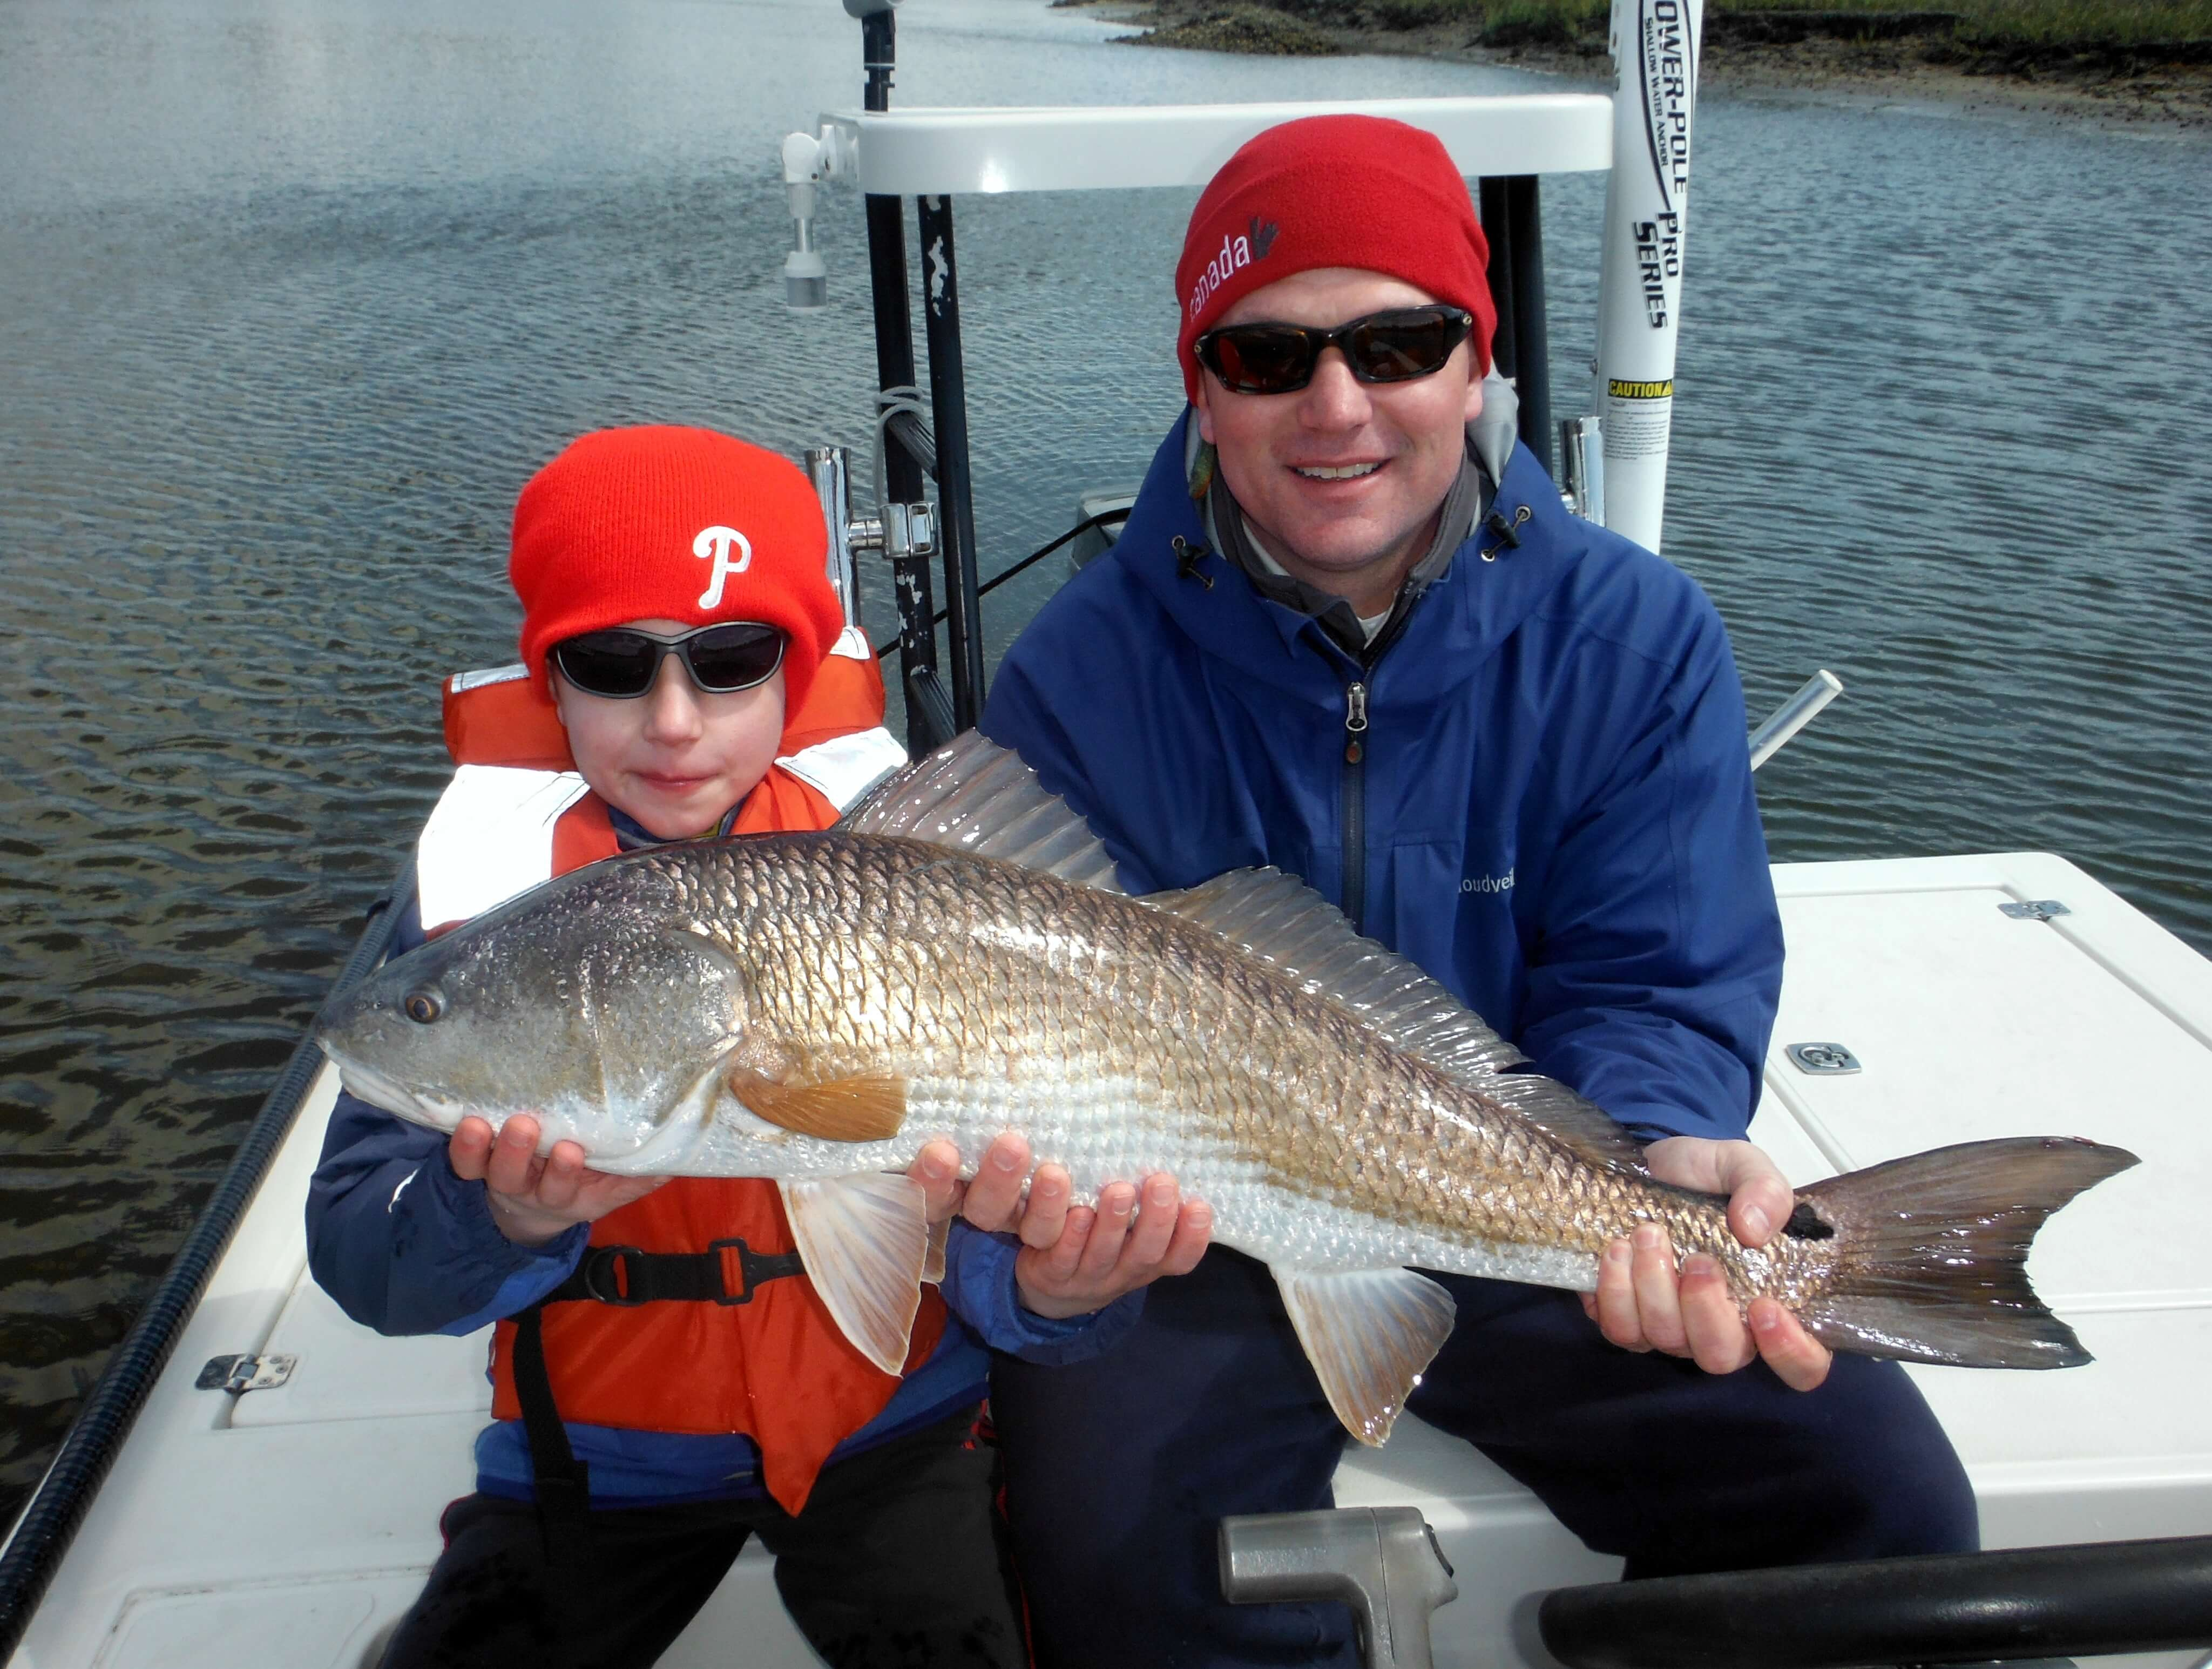 Folly beach fishing report charleston charter fishing for Kiawah island fishing